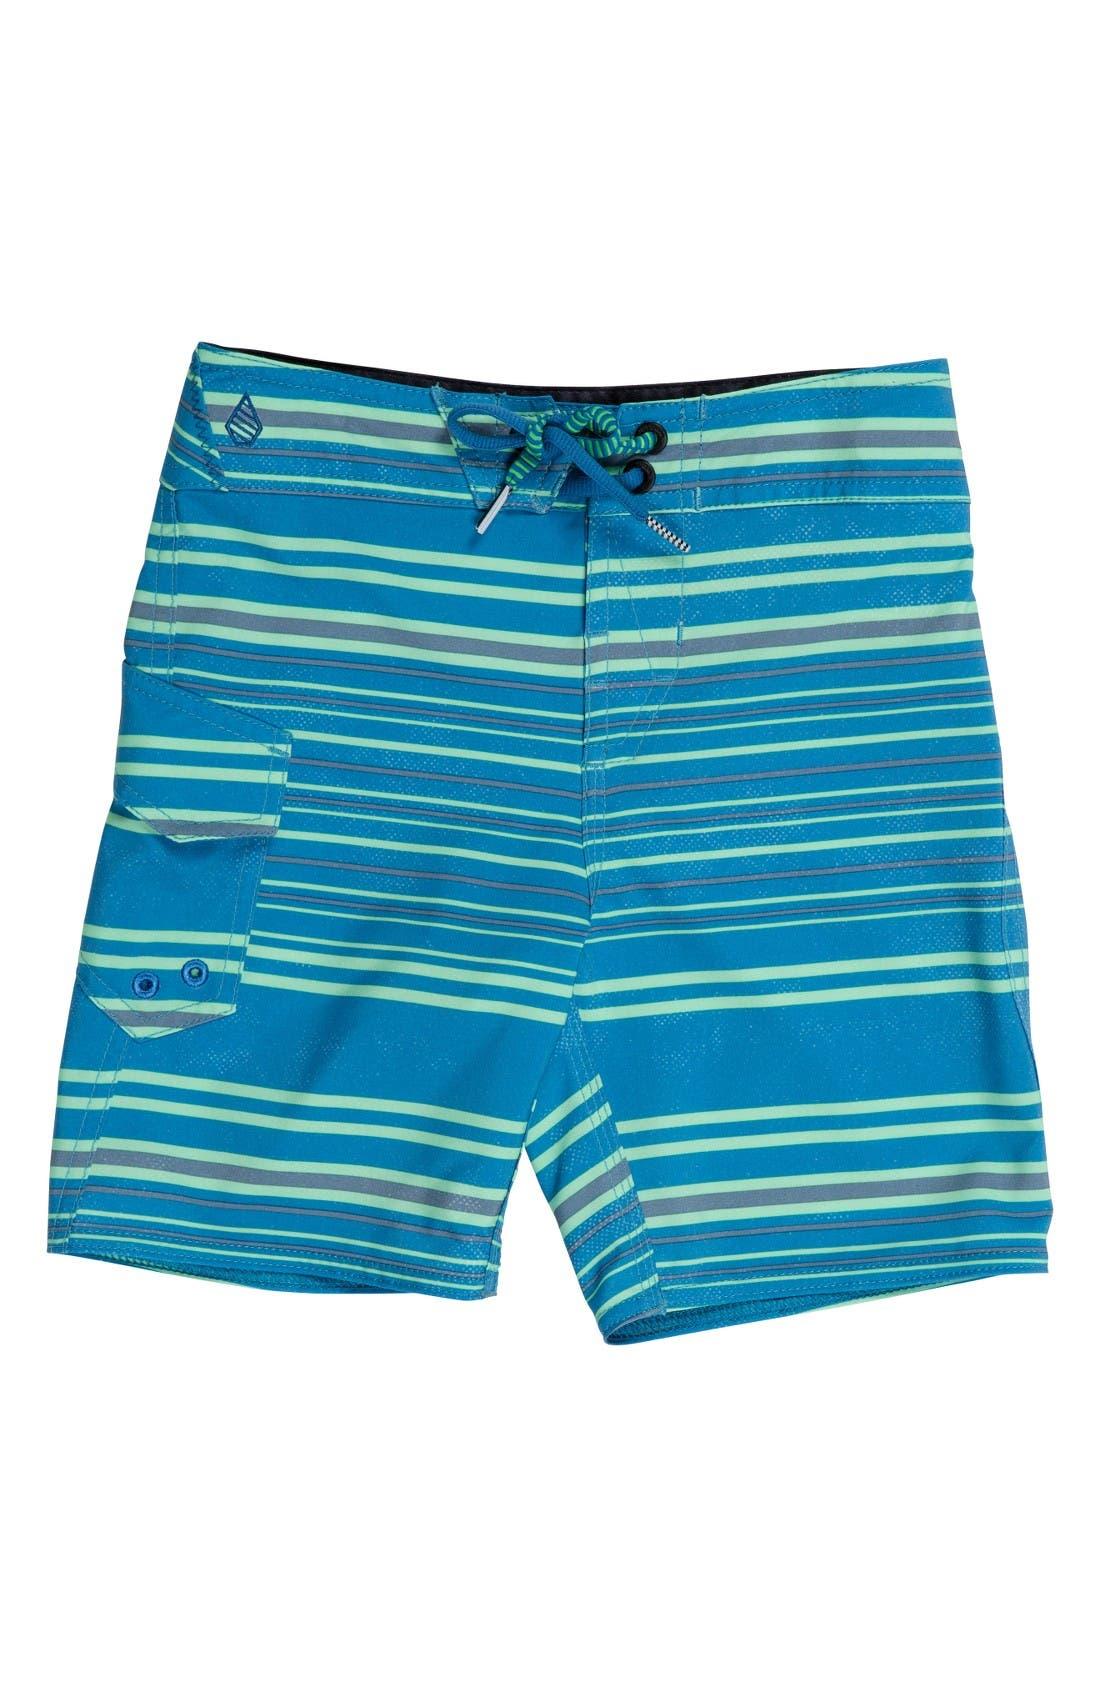 Volcom Magnetic Liney Board Shorts (Toddler Boys & Little Boys)